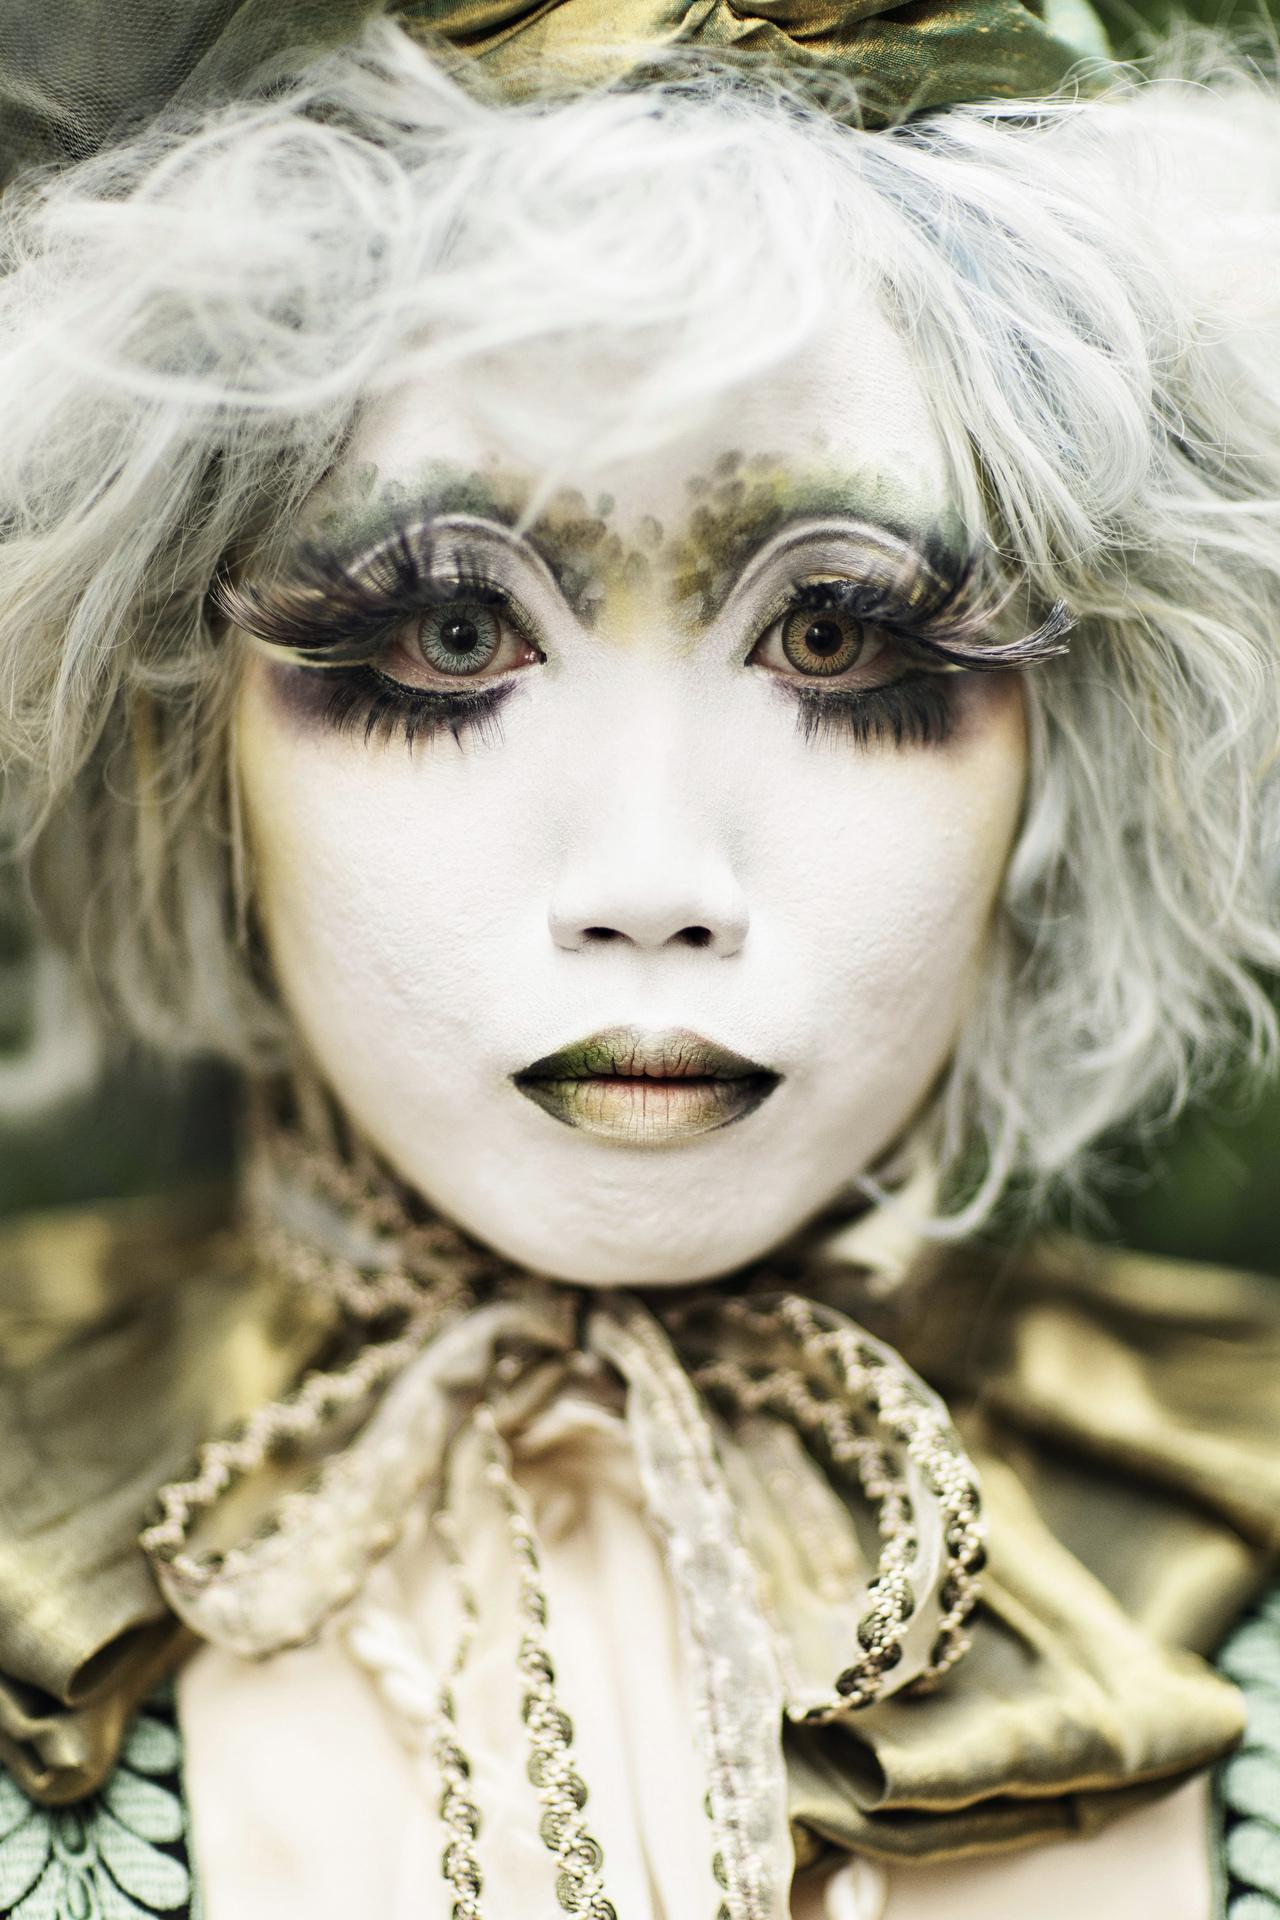 Sydney portrait photographer, personal branding, head shots, corporate photography, Japan, Minori